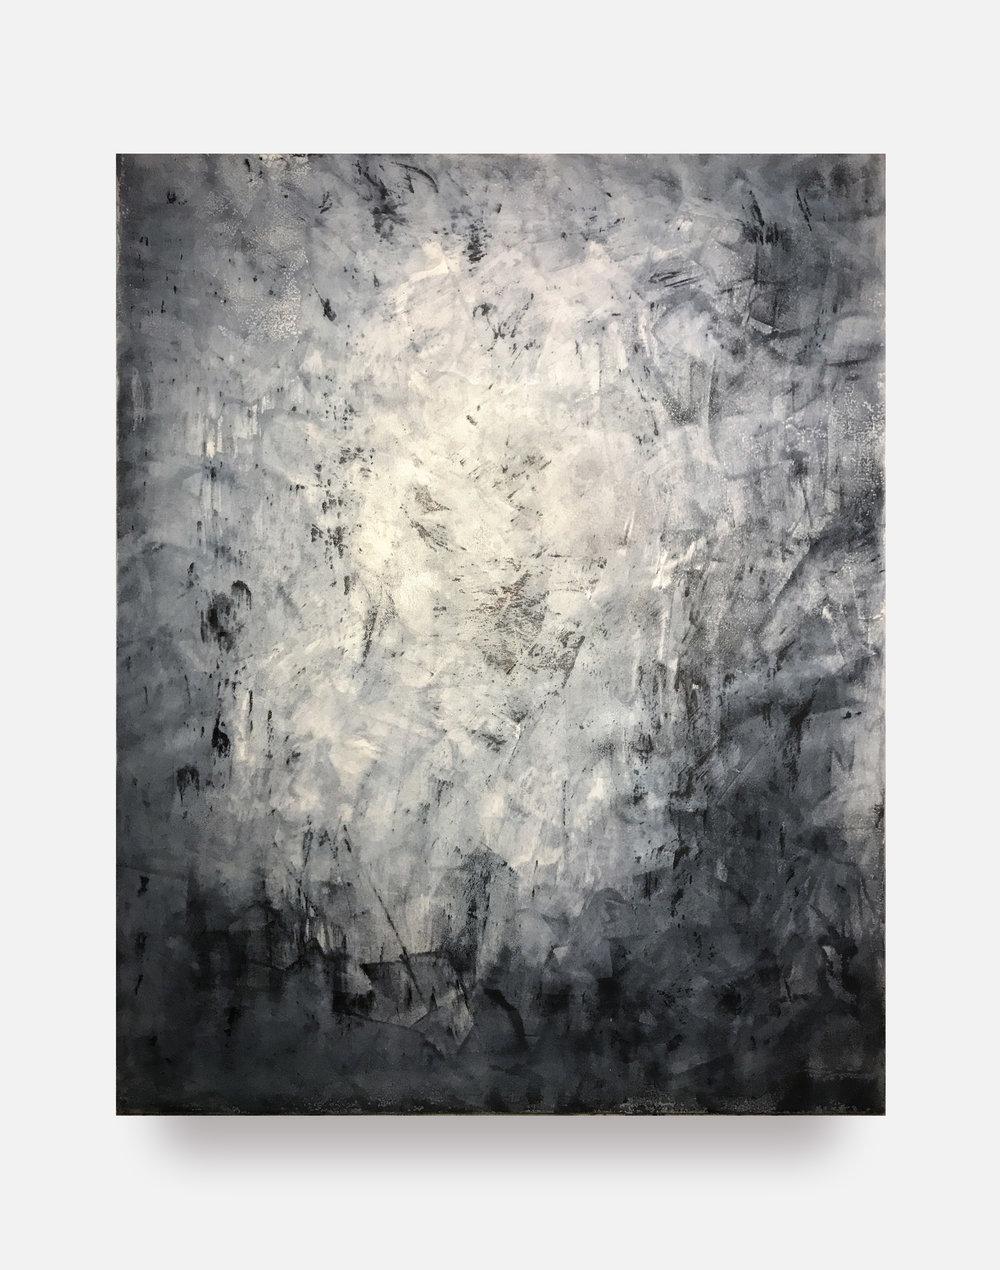 Untitled (Commission), 2017